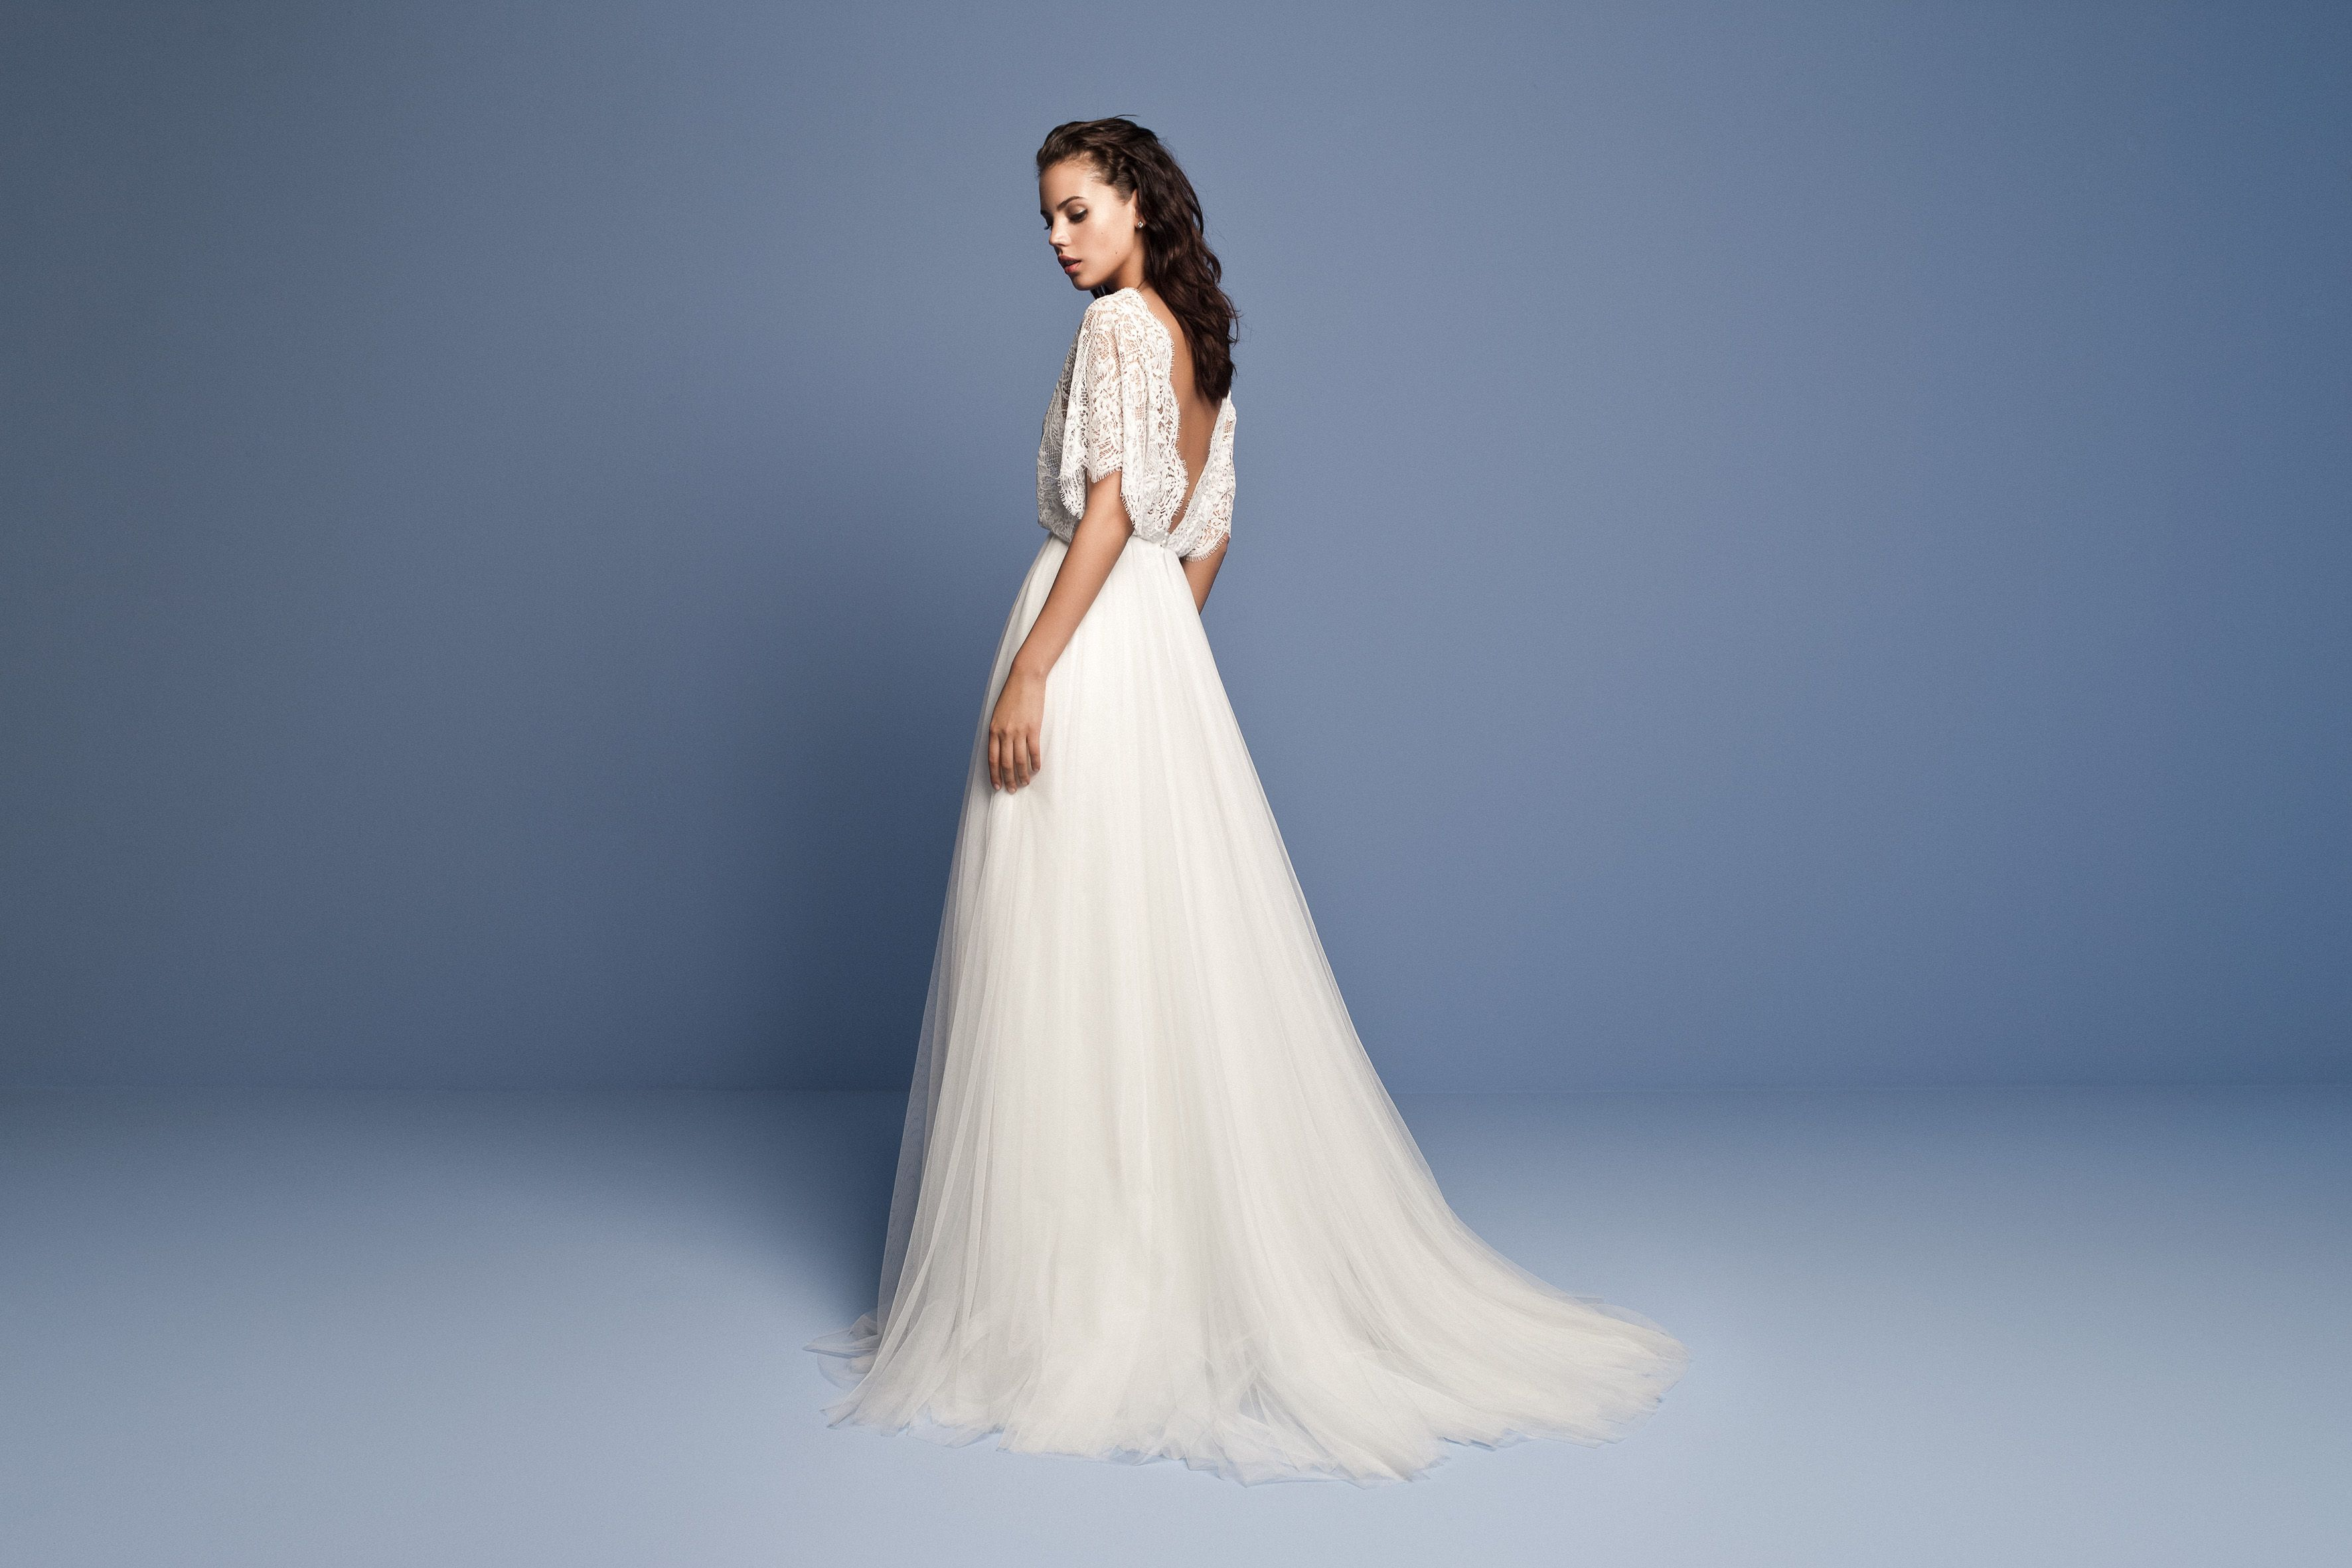 Unique Wedding Dresses Taunton Ensign - All Wedding Dresses ...